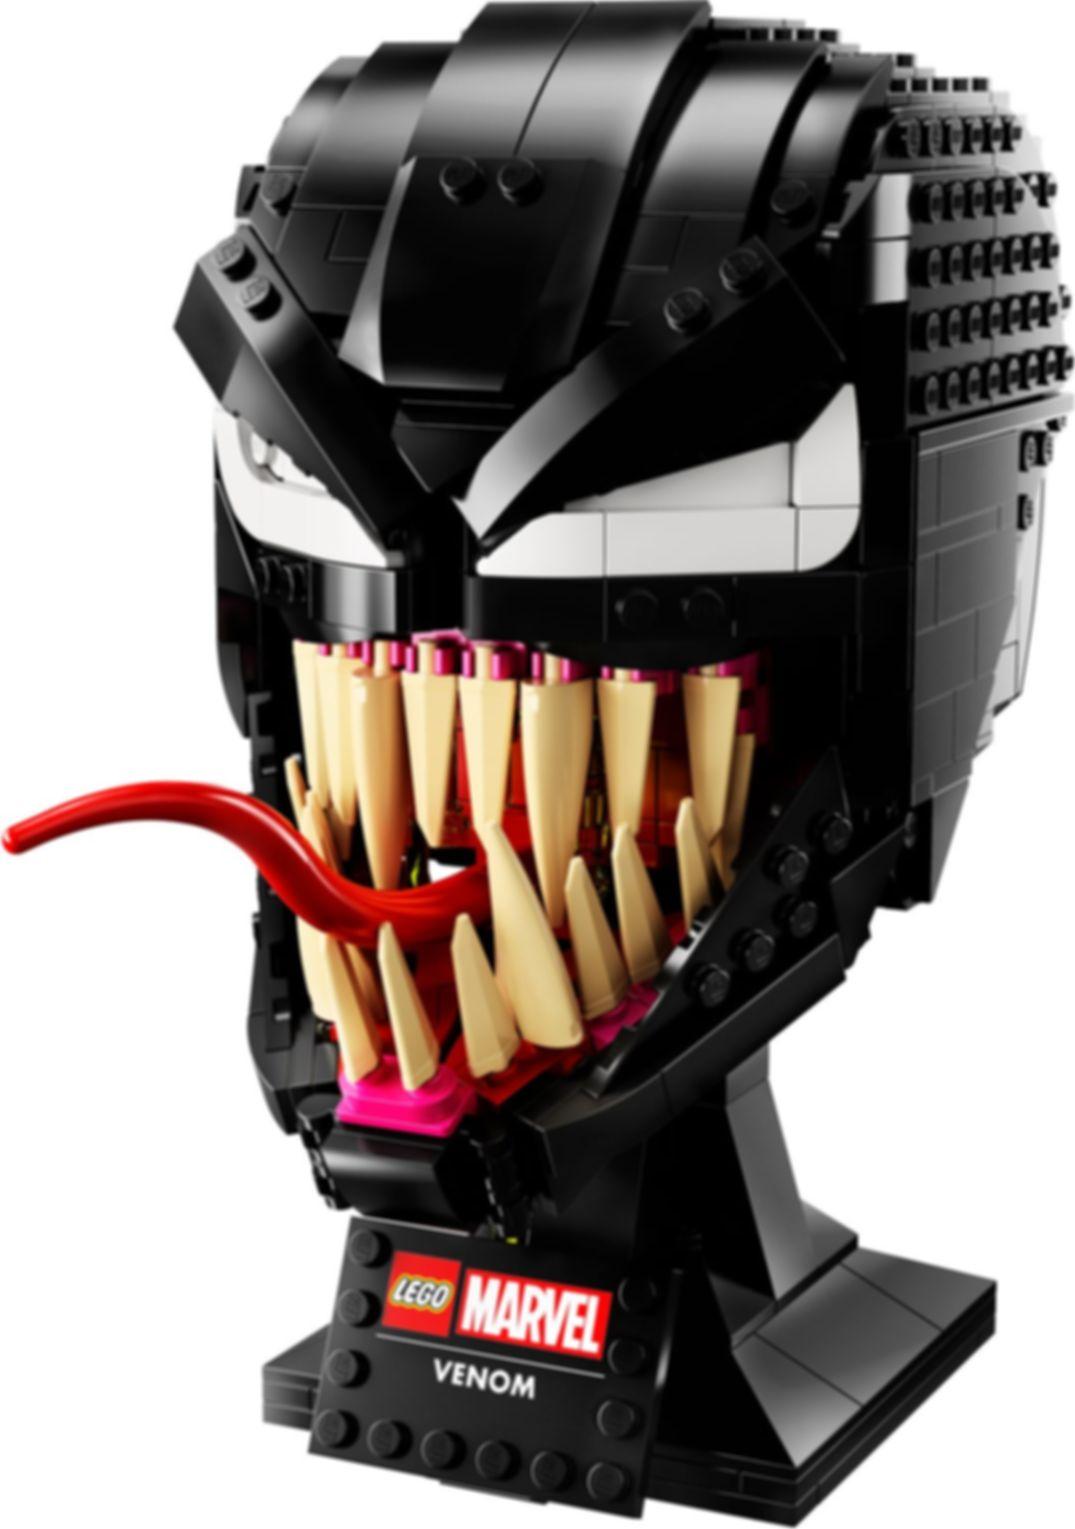 LEGO® Marvel Venom components